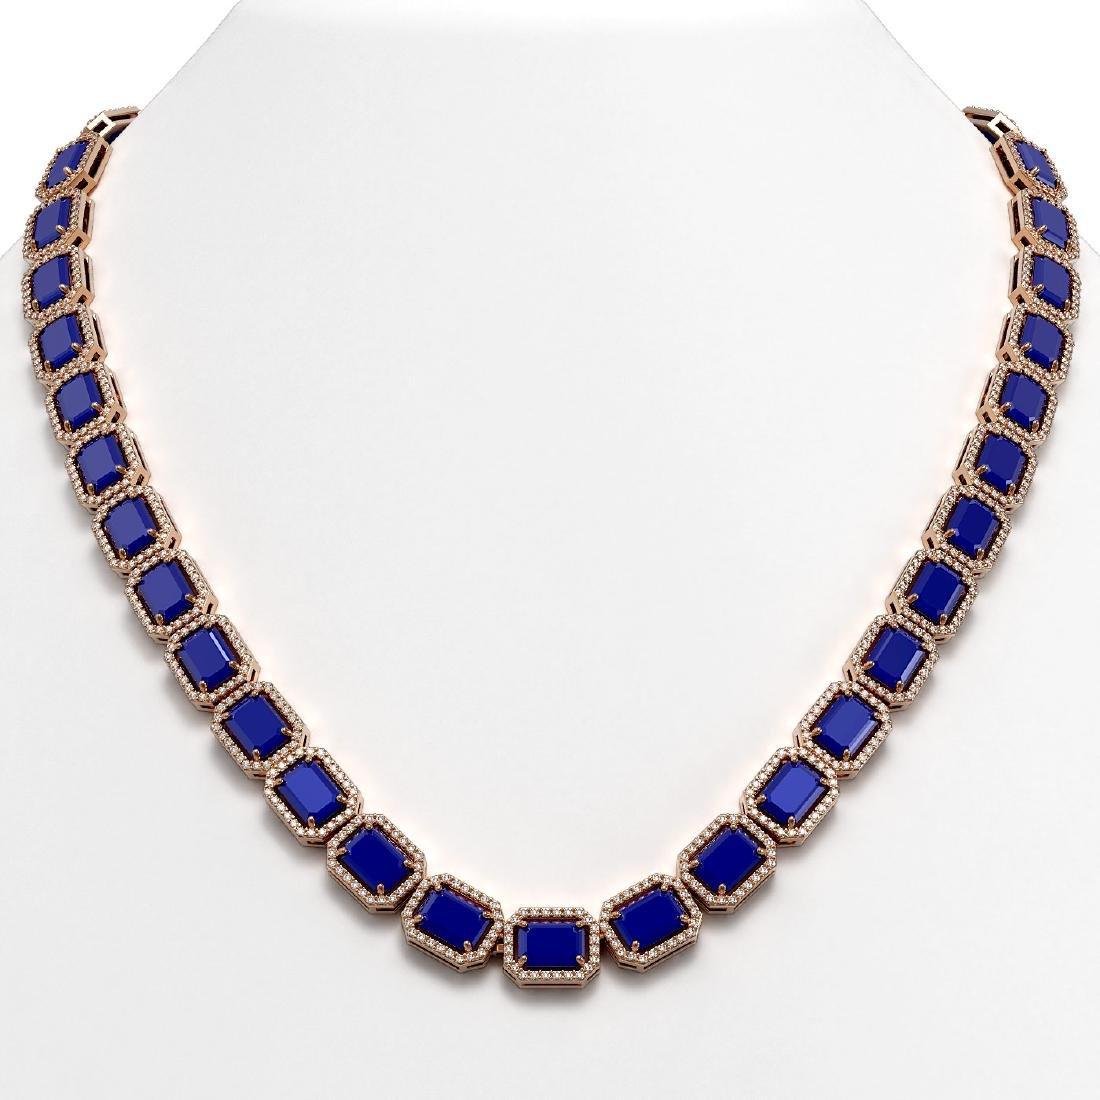 58.59 CTW Sapphire & Diamond Halo Necklace 10K Rose